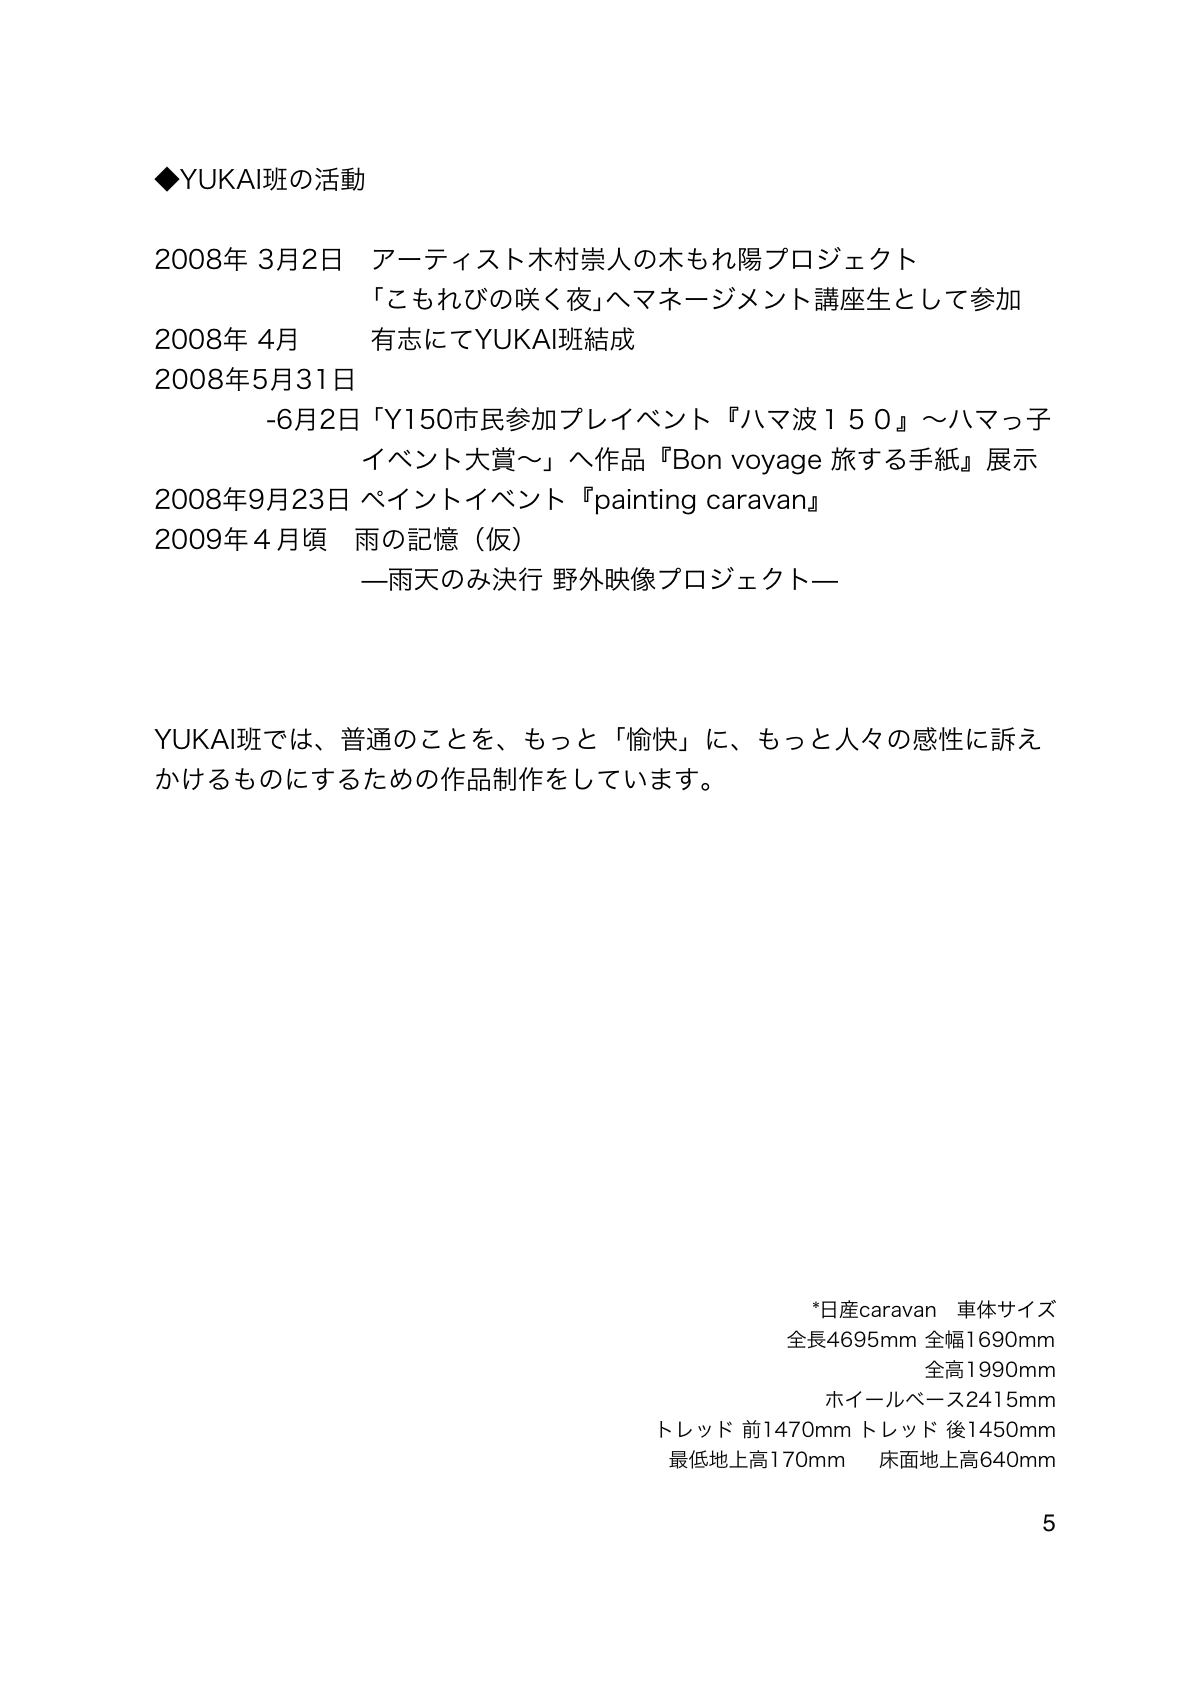 AICスキルアップ講座より、「YUKAI班」誕生_d0058440_714928.jpg